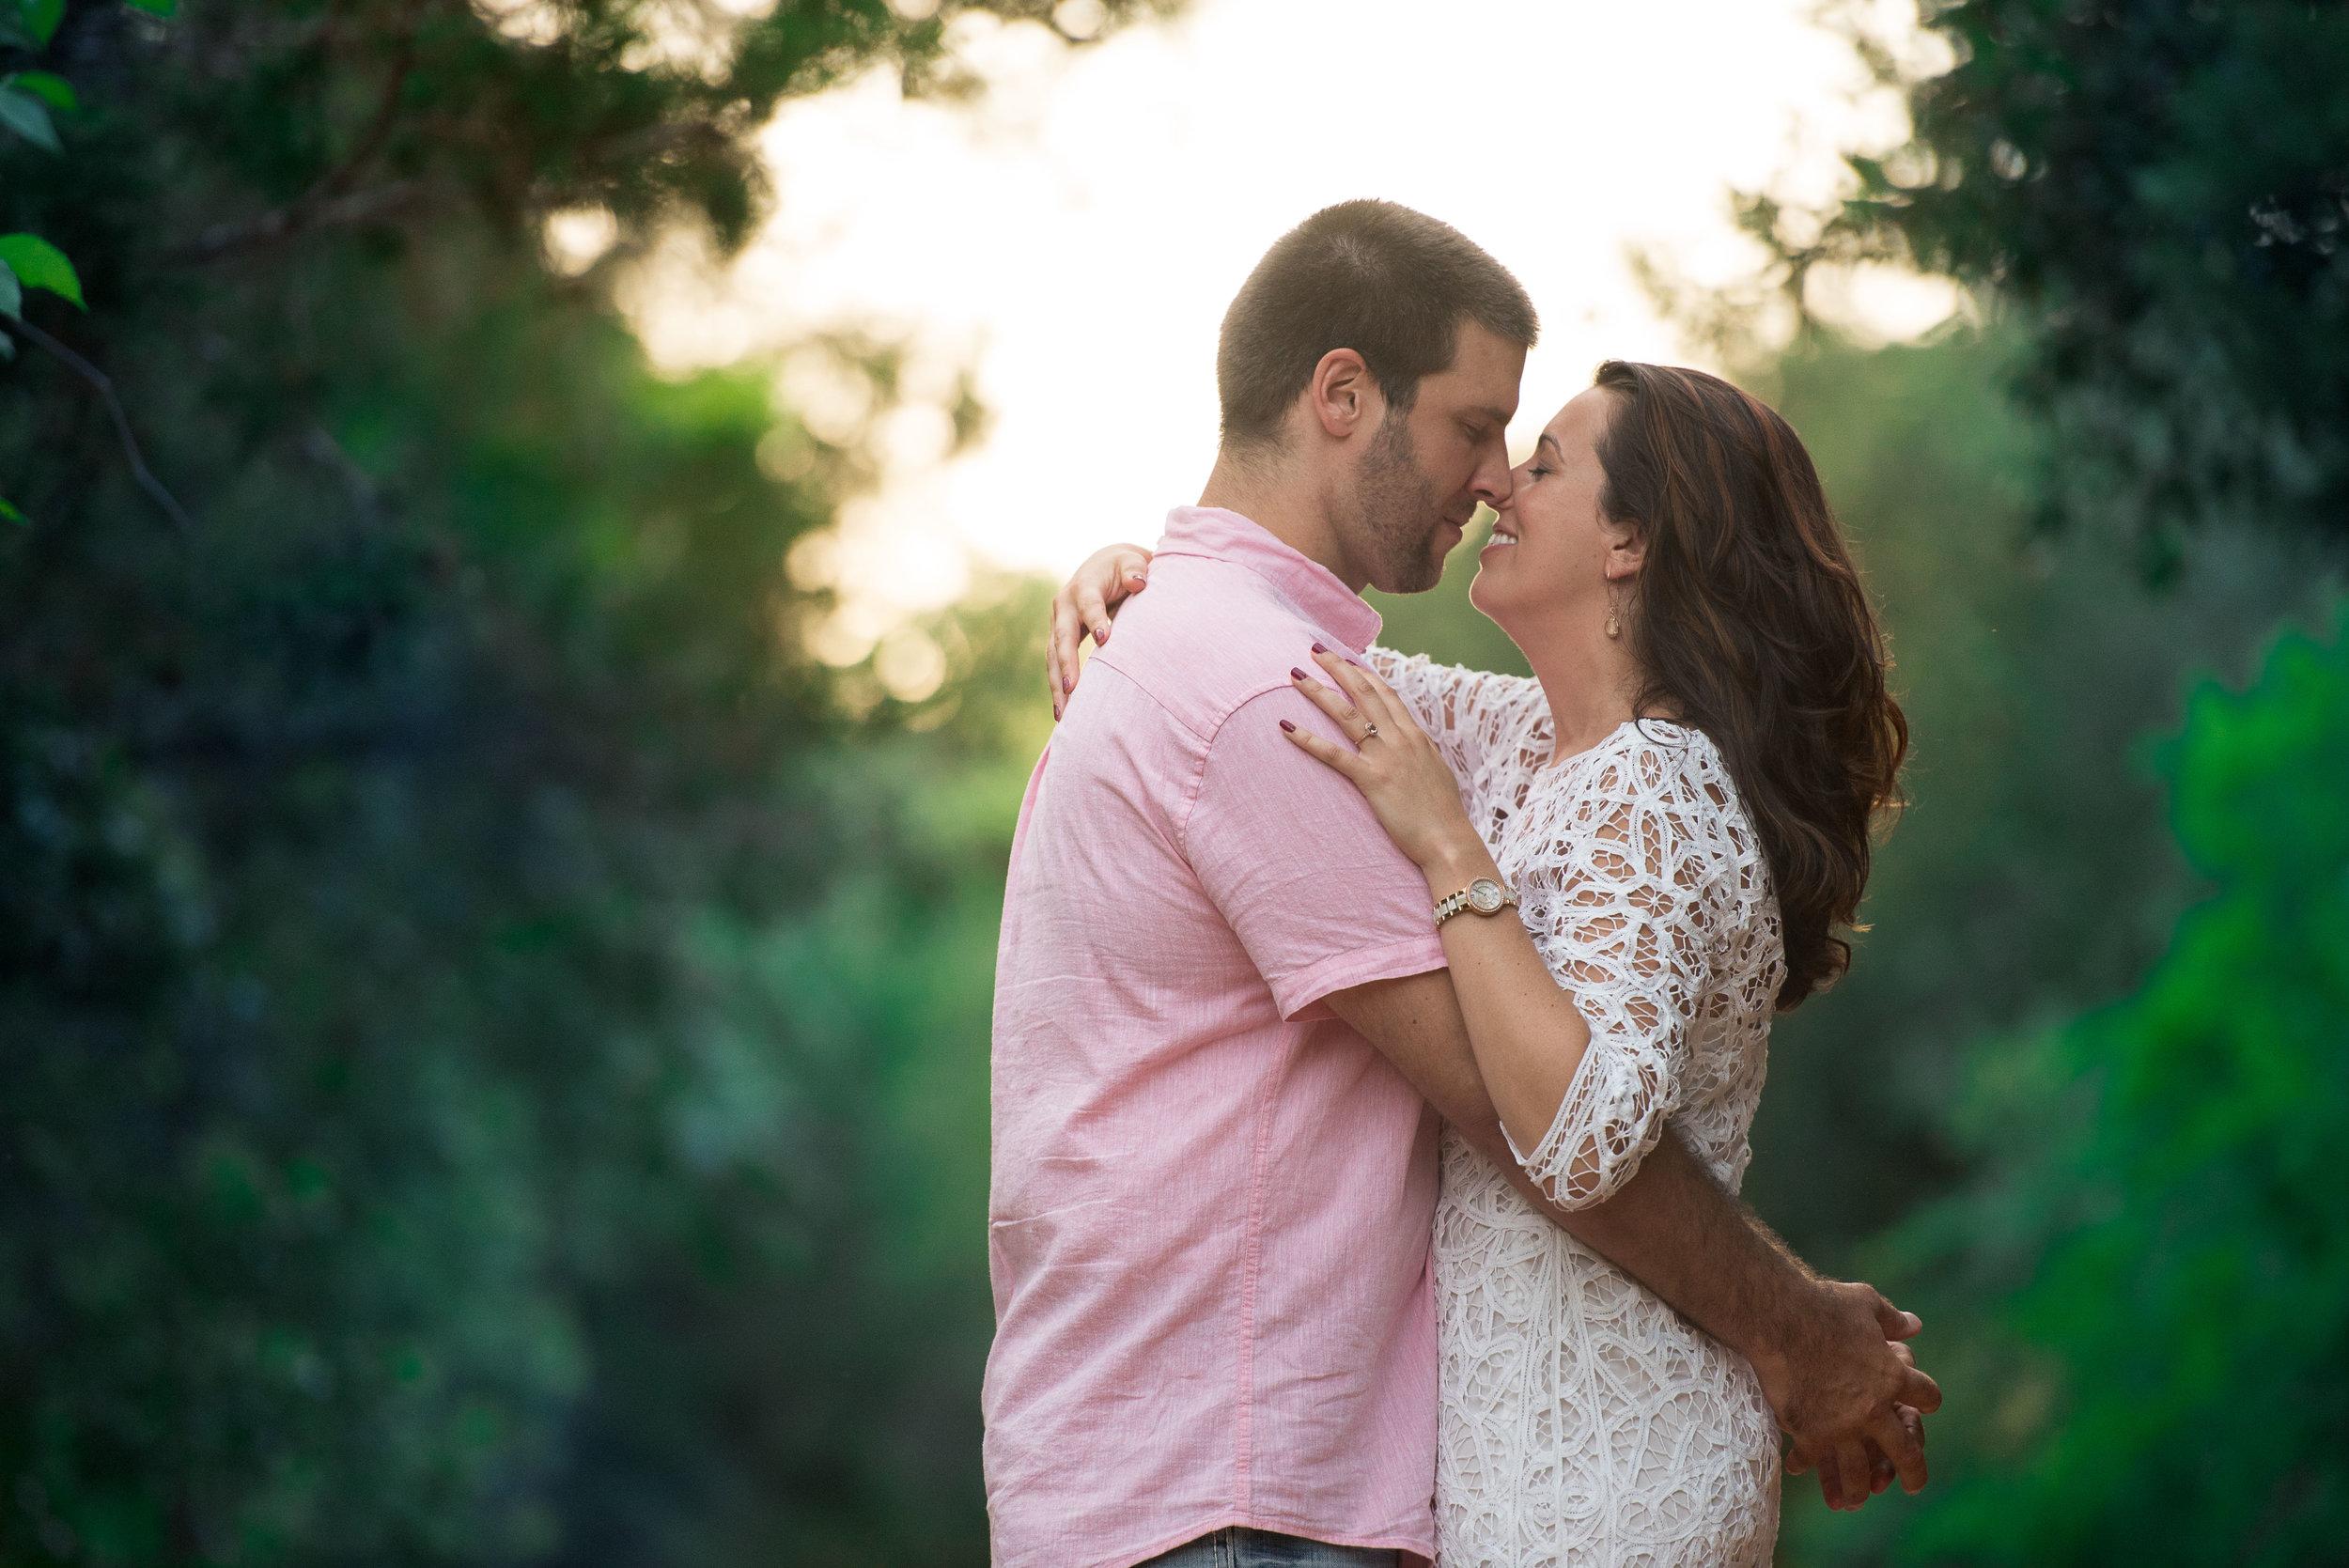 Austin Texas Engagement Photography  Mira Visu Photography Rebecca Hofstetter-1-17.JPG